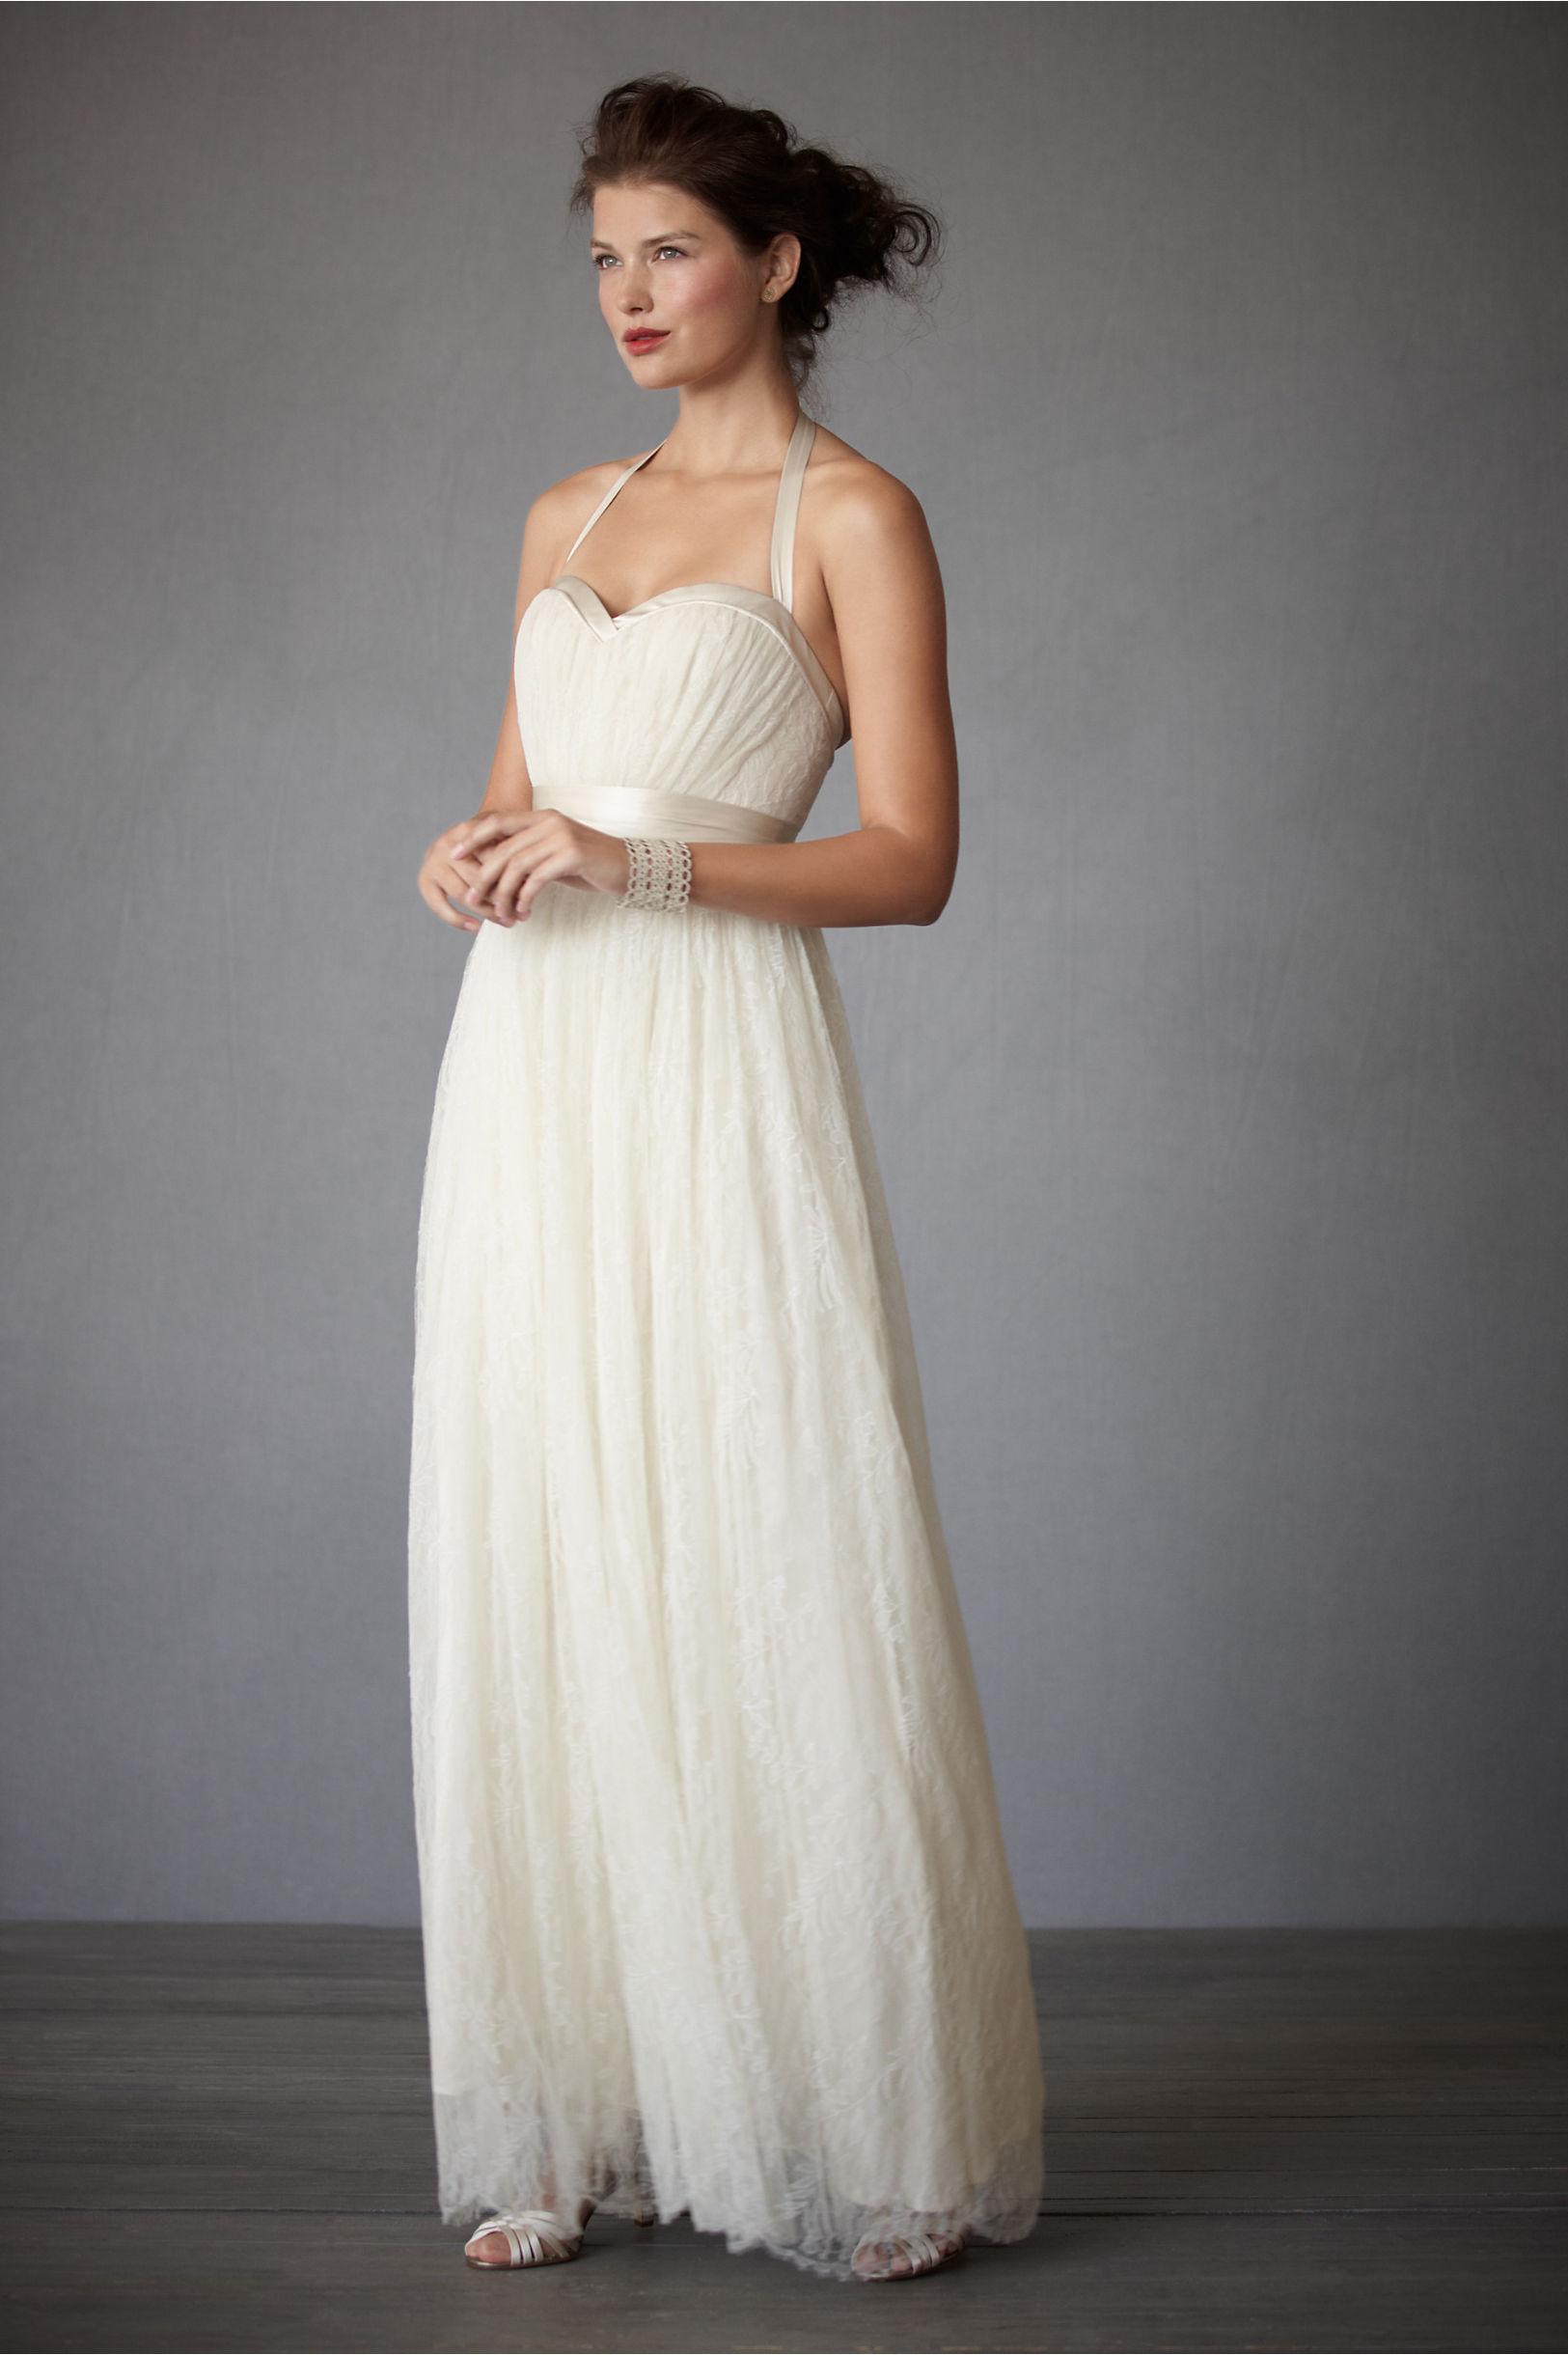 halter wedding dress ivory 2012 bhldn bridal gowns